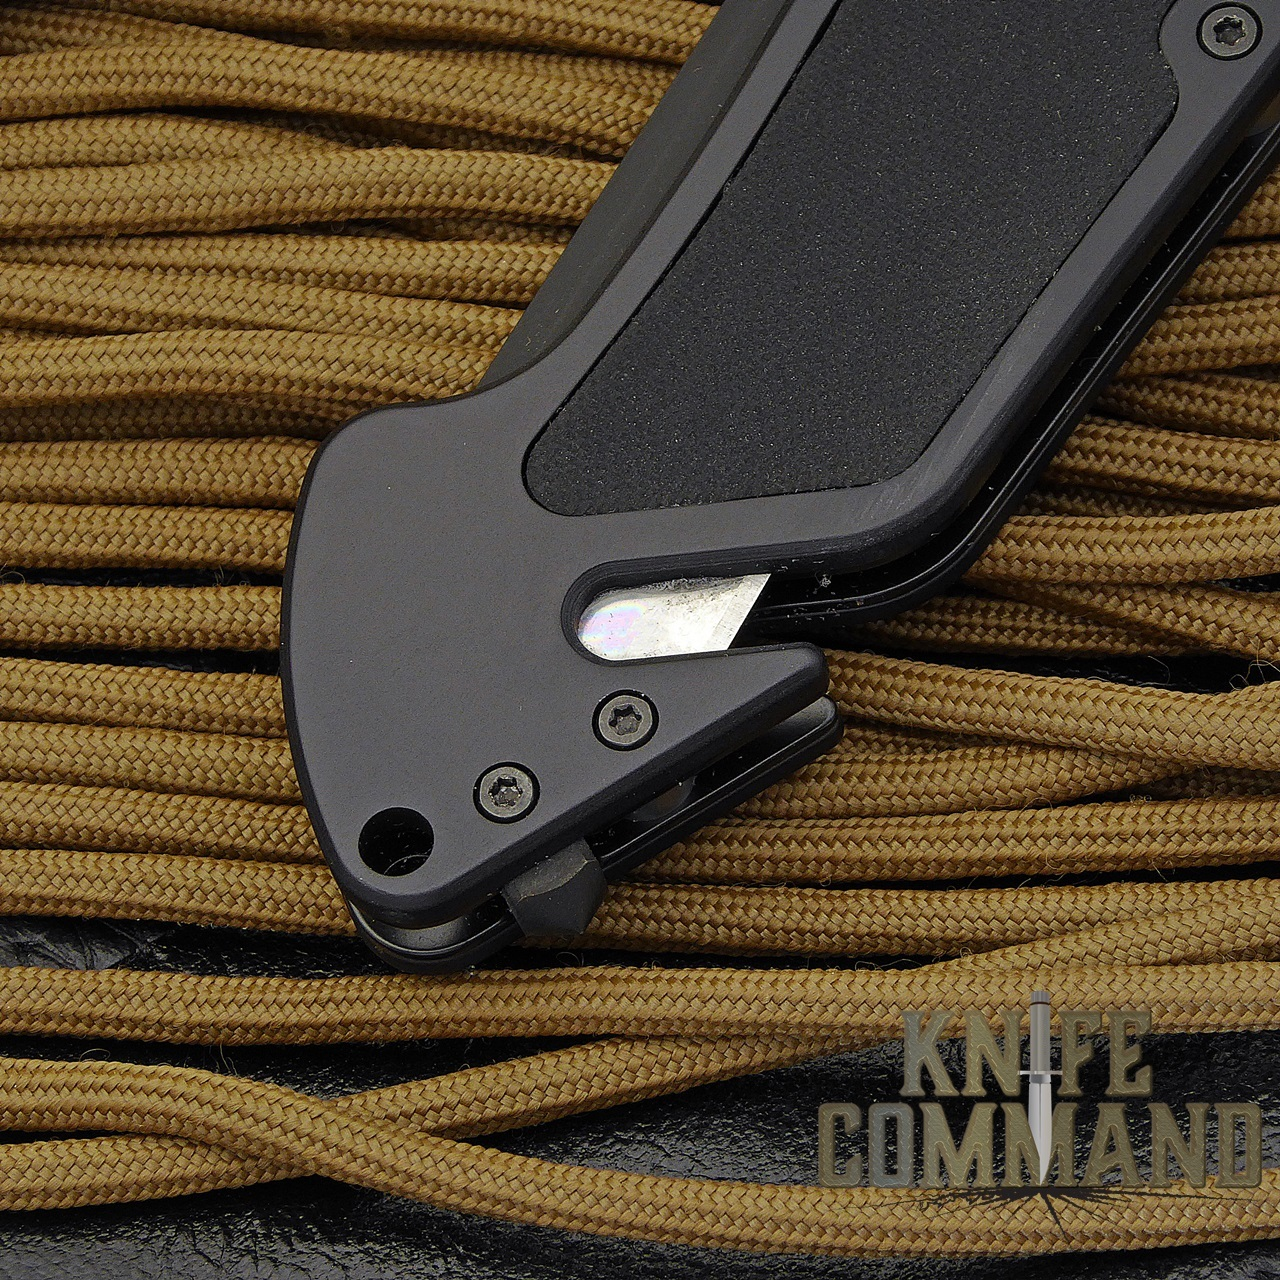 Eickhorn Solingen PRT X Black Tanto Tactical Emergency Rescue Knife.  Glass breaker and belt cutter.